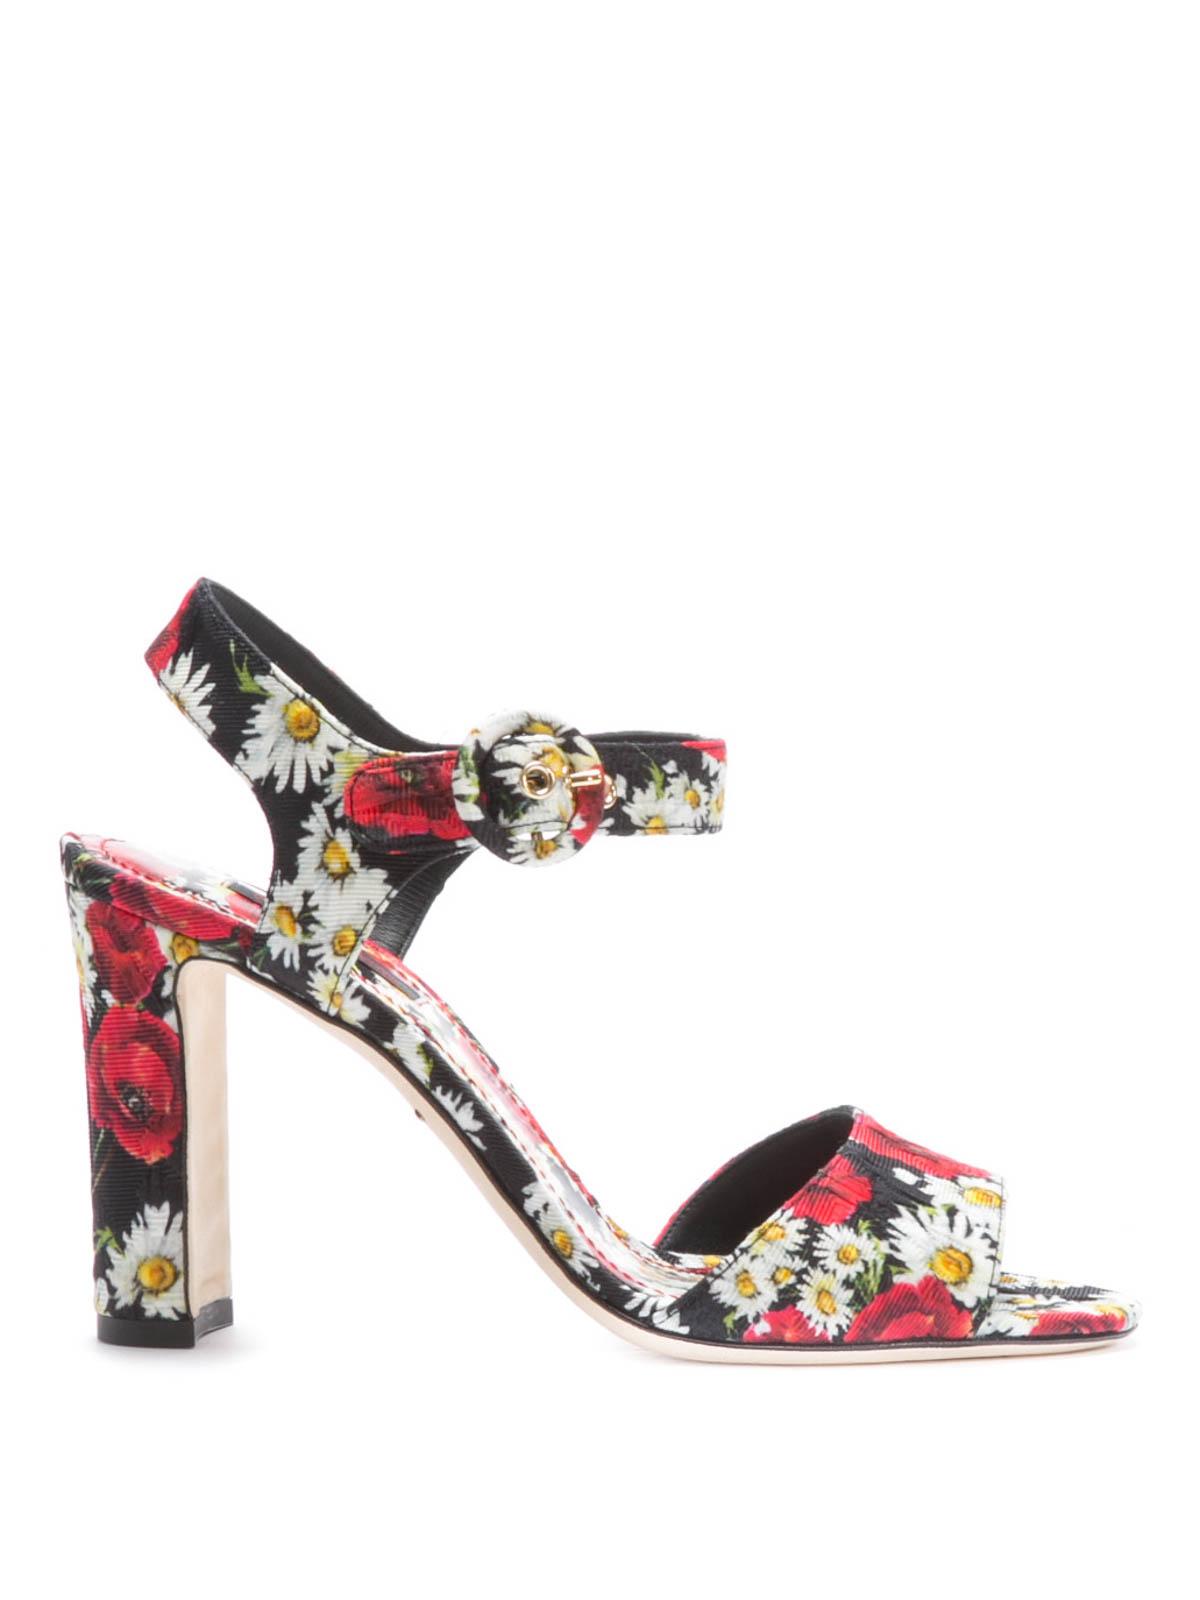 Dolce   Gabbana - Sandalo stampa floreale - sandali - CR0107 AR384 8Q885 520555c92ea